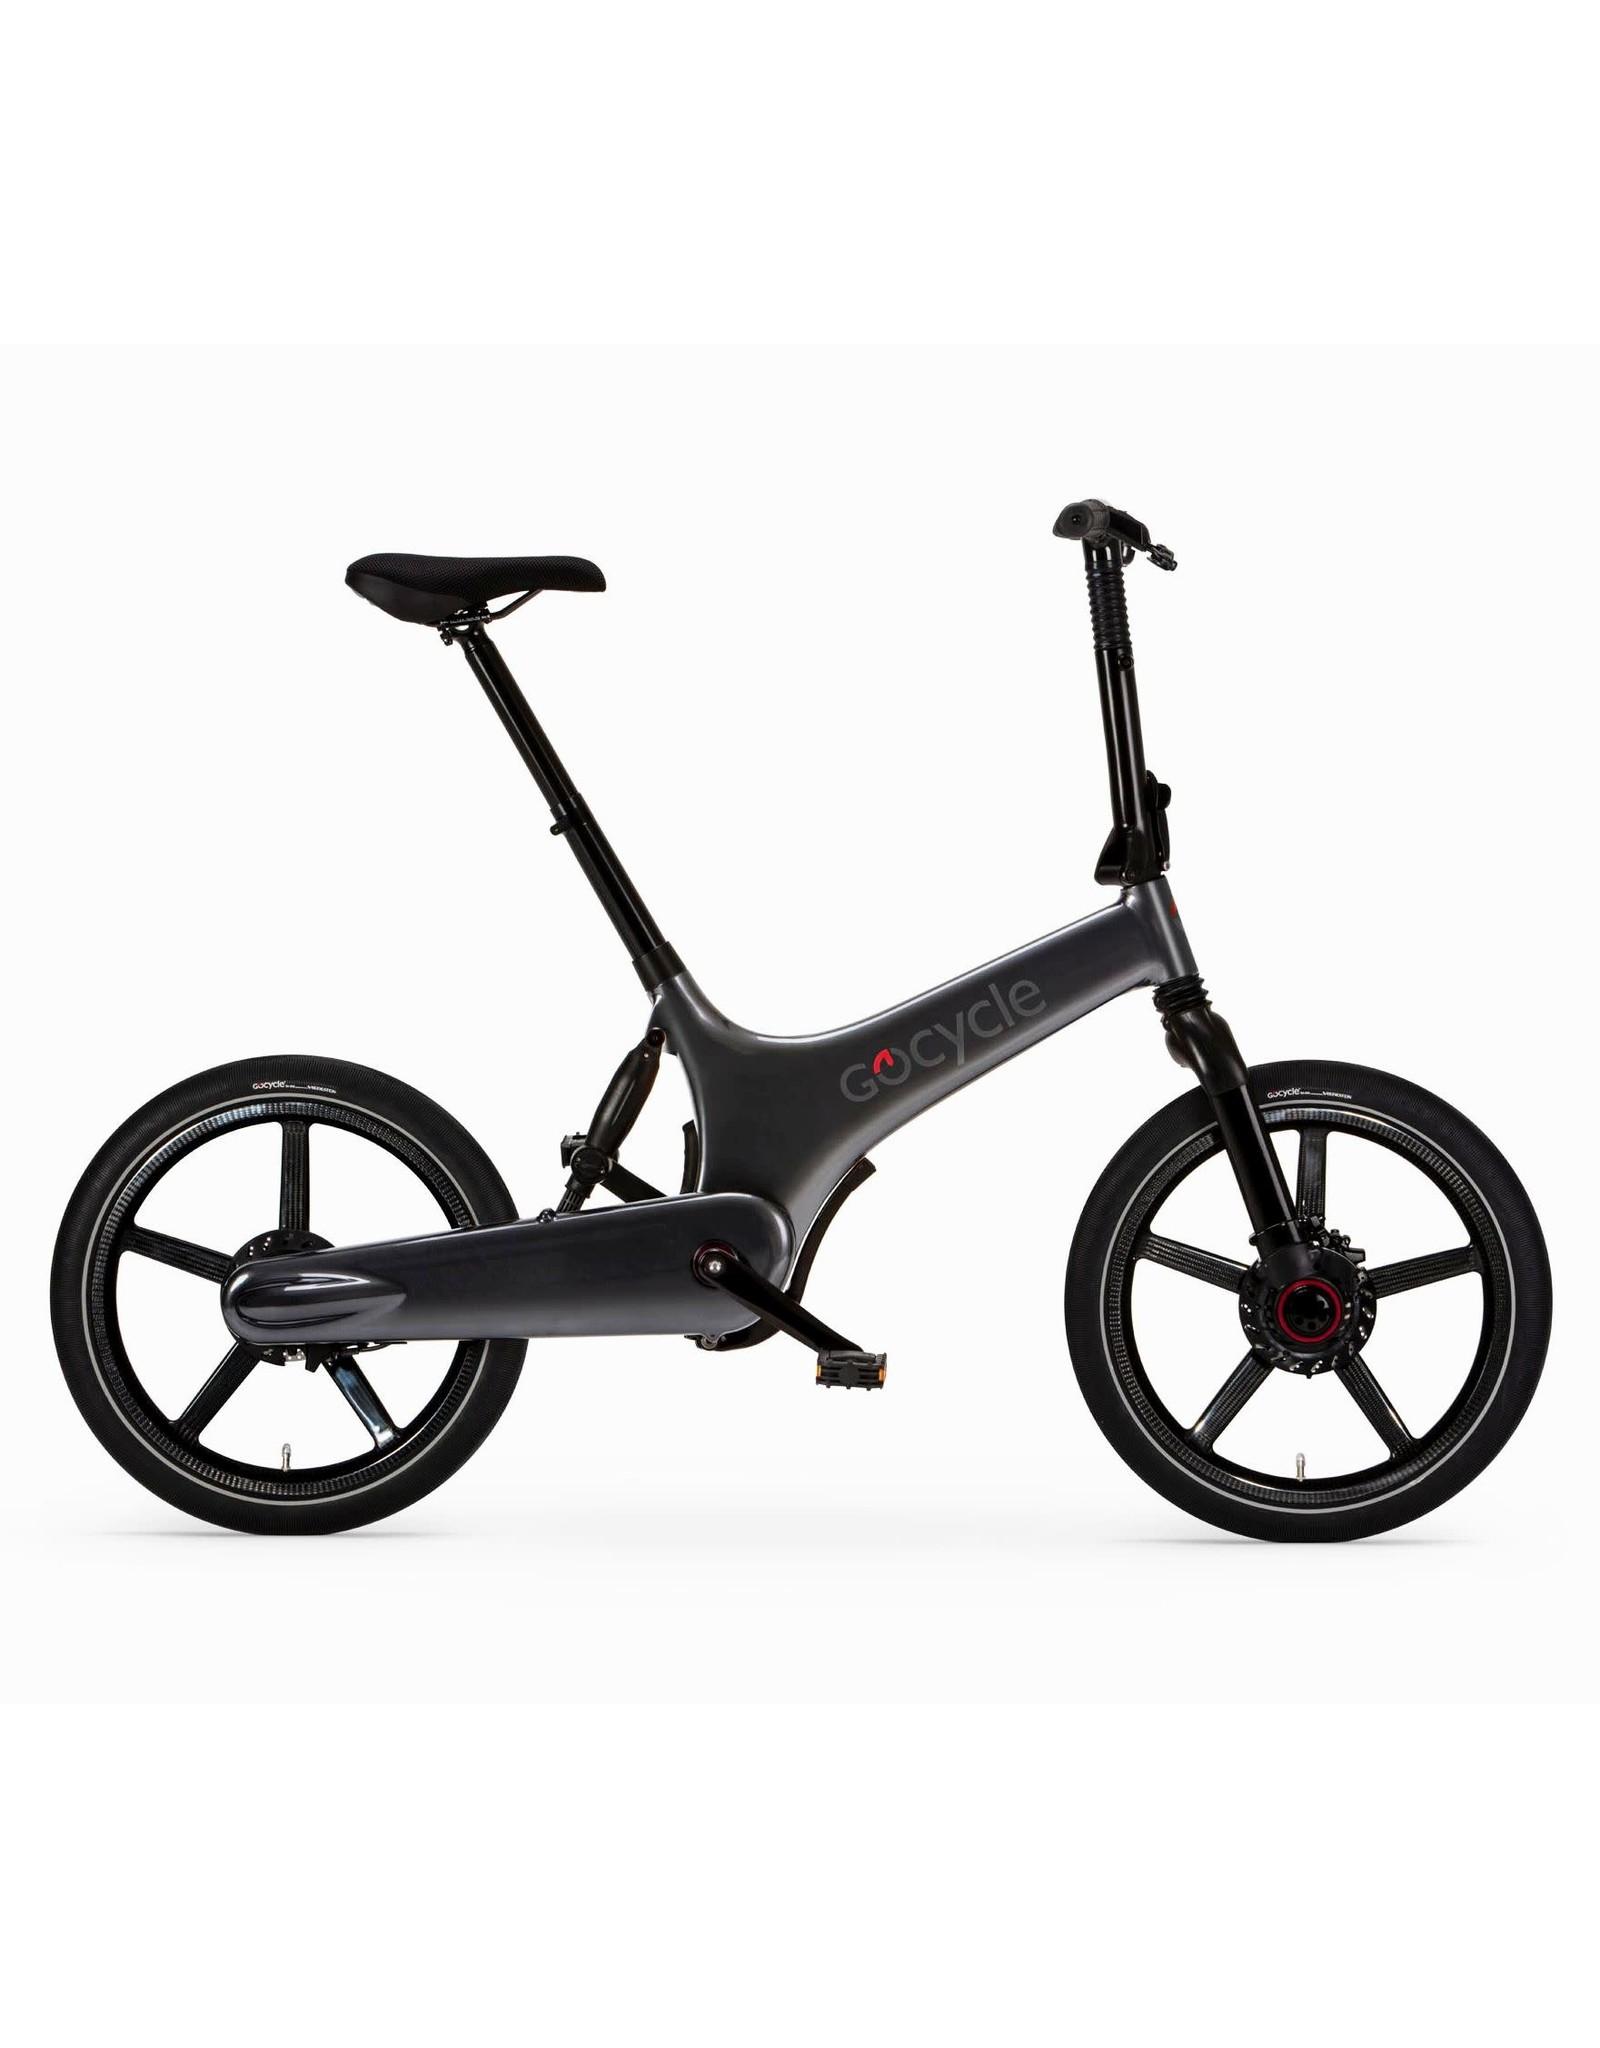 Gocycle GoCycle G3+ folding electric bike grey